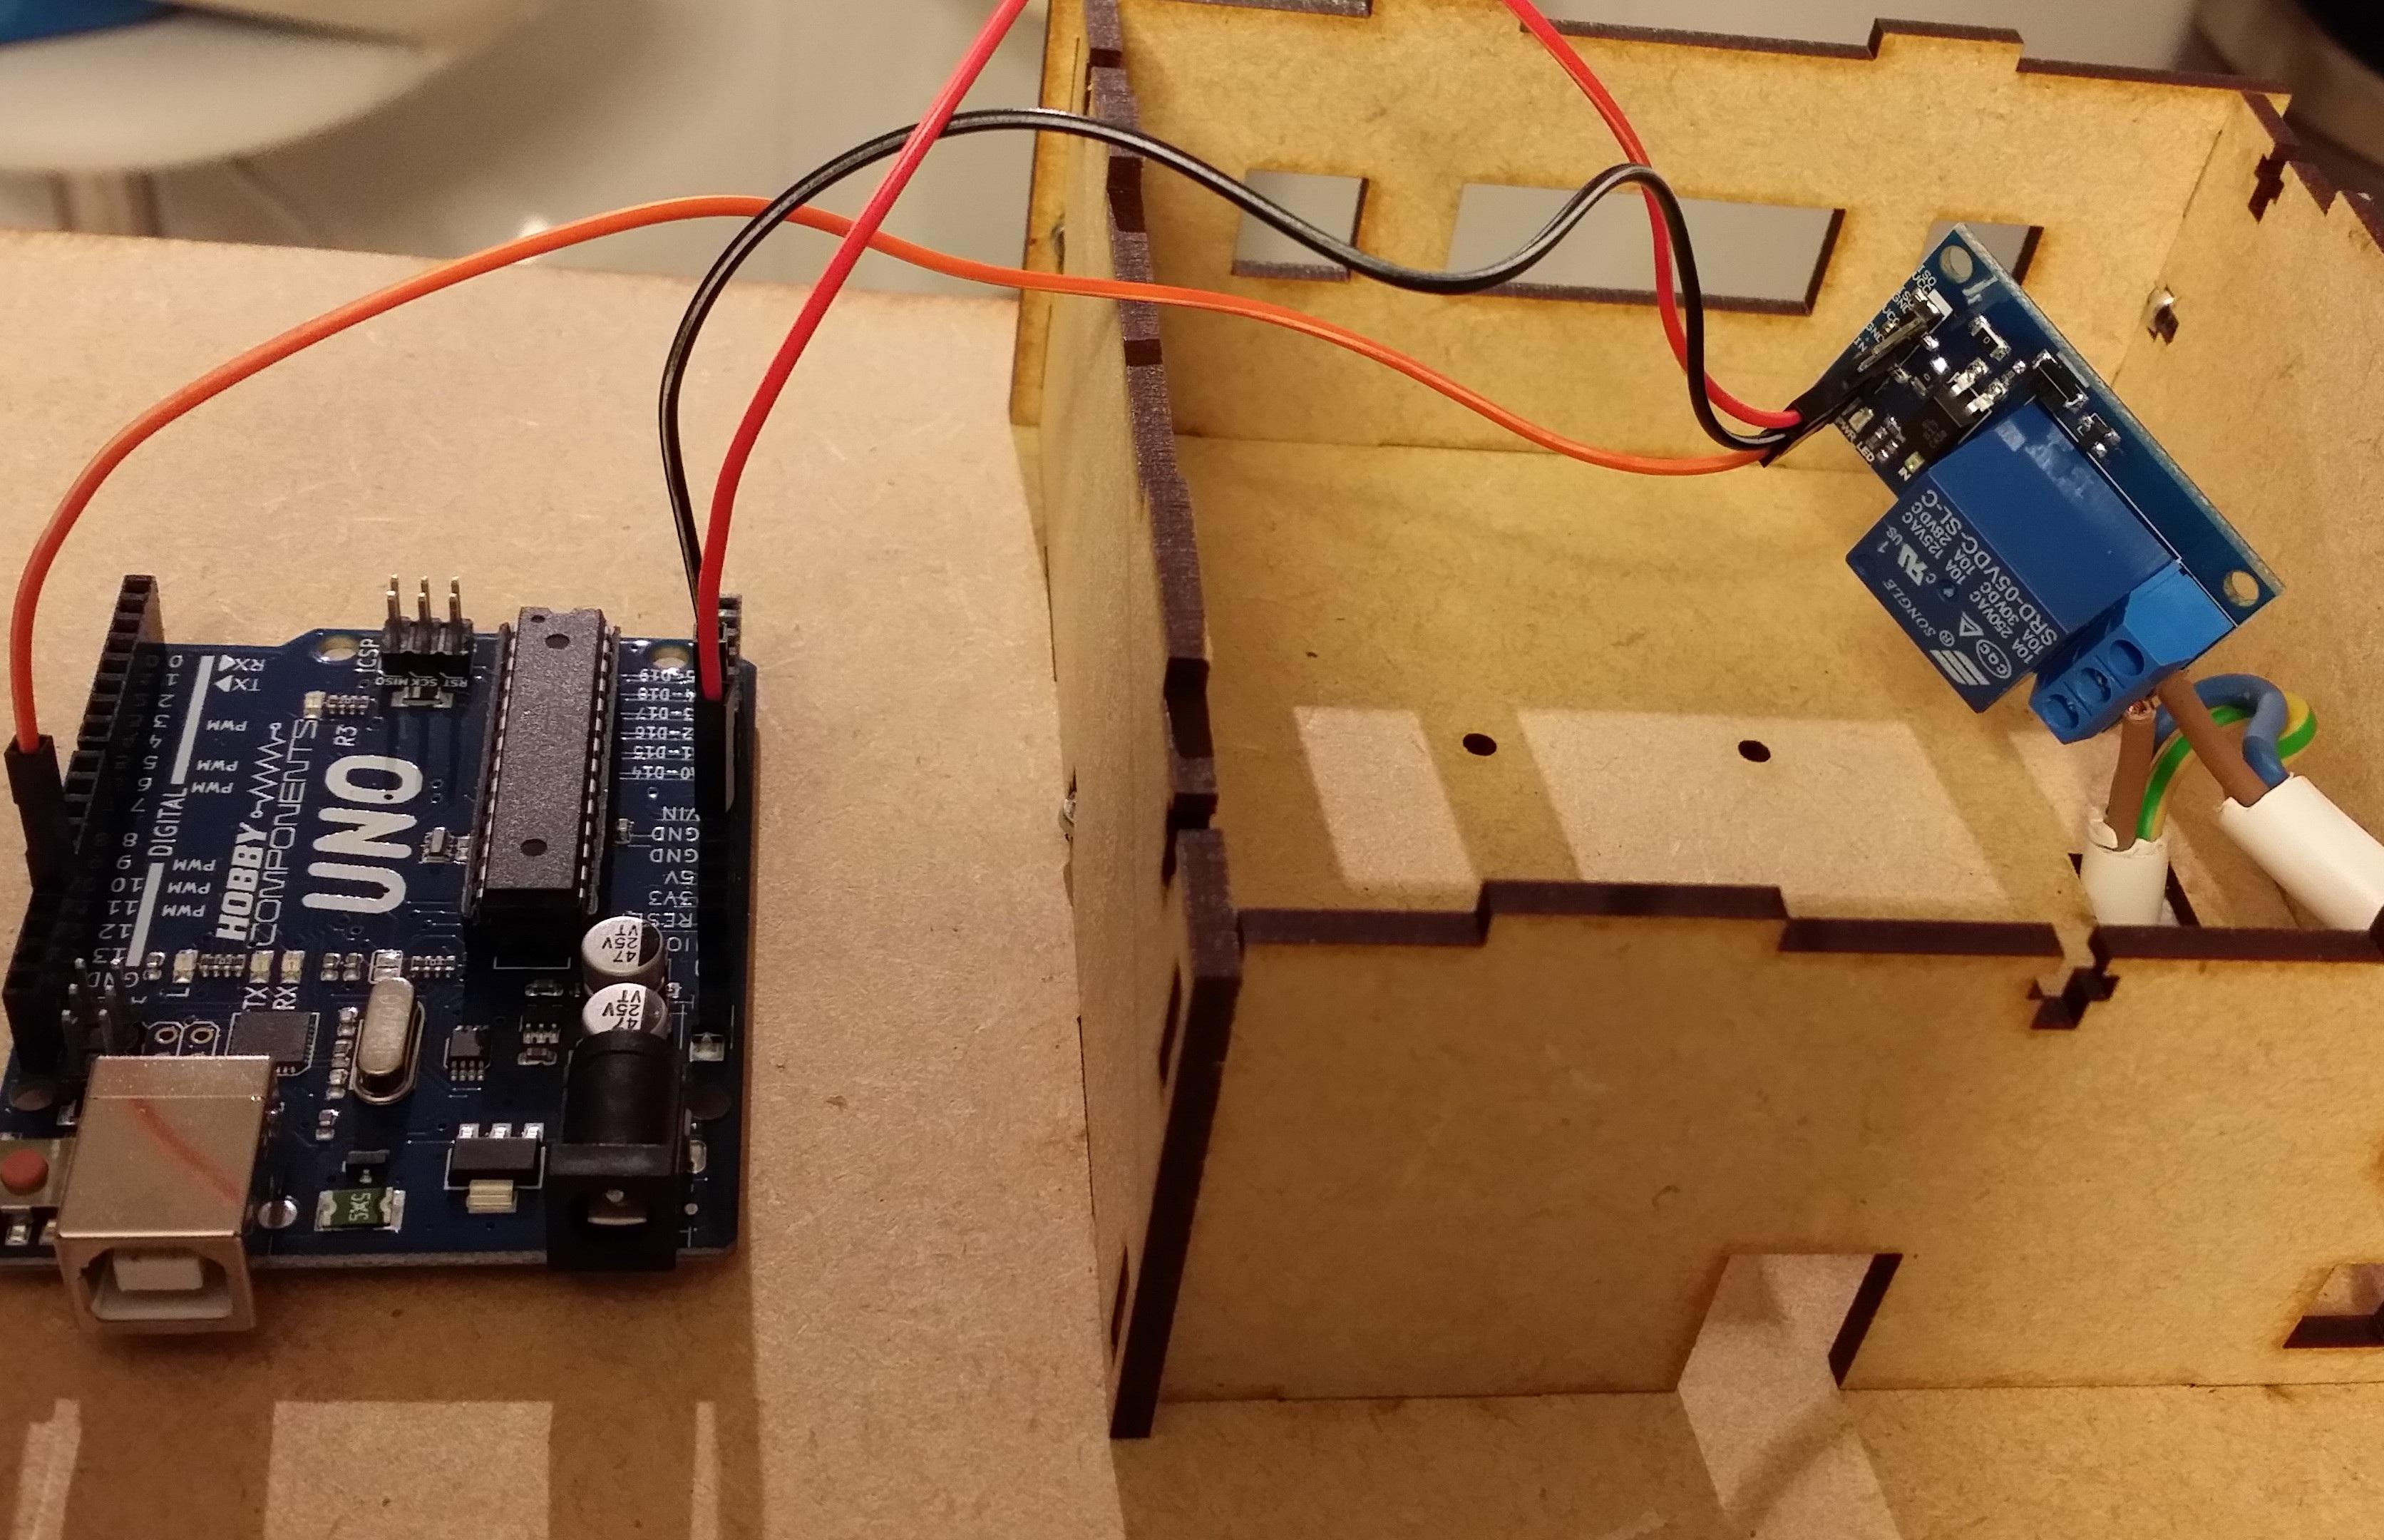 Incubator Arduino Claudias Bricks Biohacking Building Blocks Relay Electronic Brick Fan